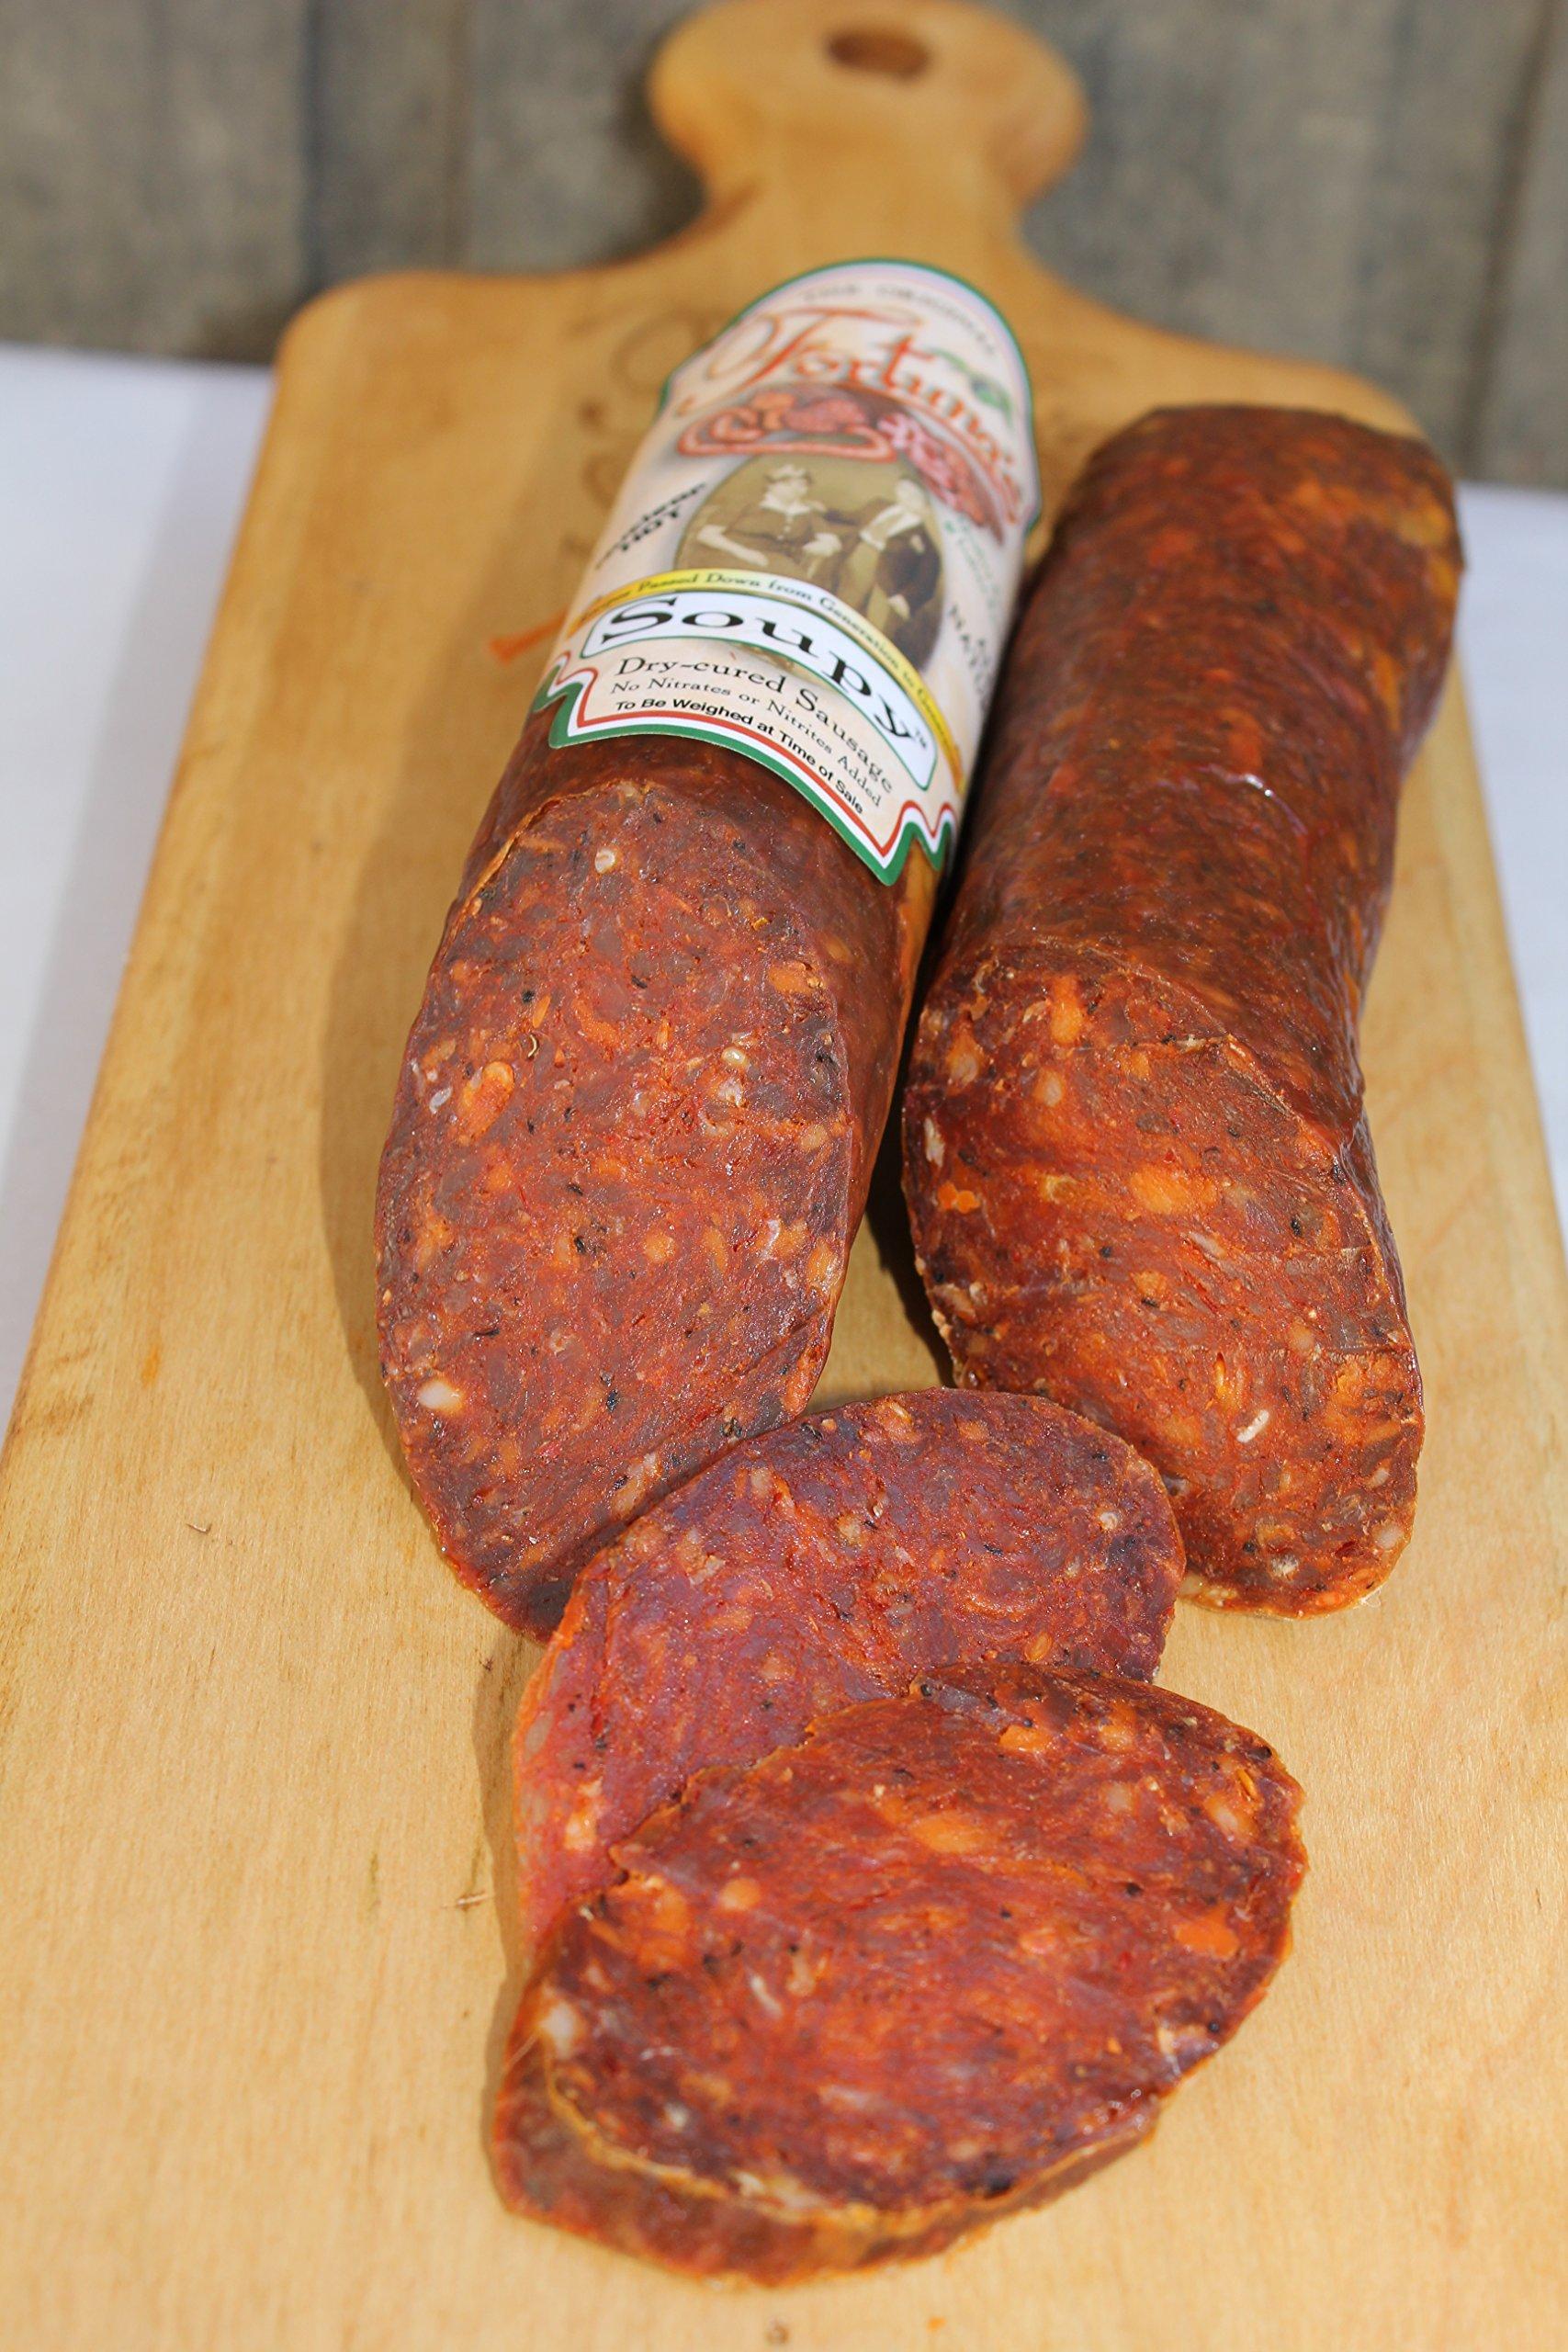 Soupy Salami -All Natural, Nitrate Free/Gluten Free (Sopressata, Supri 10oz